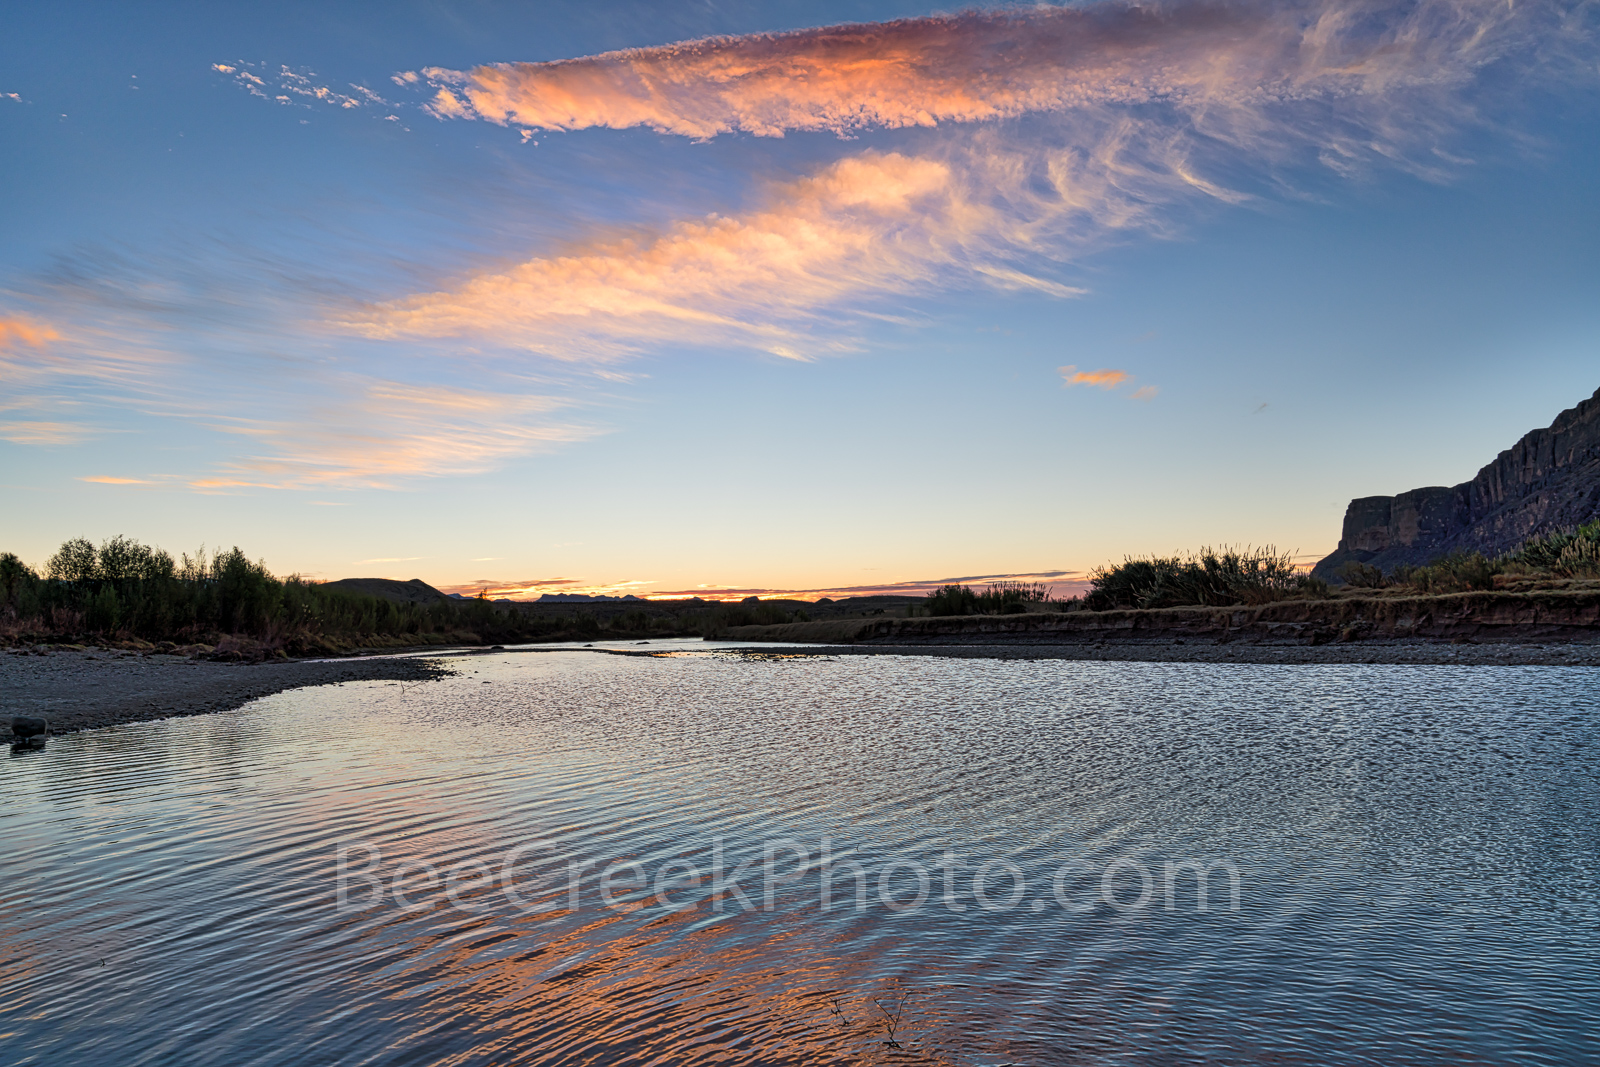 Sunrise, Rio Grande river, Big Bend National Park, Big Bend, color, water, reflected, Santa Elena Canyon, texas landscape, texas sunrise,, photo